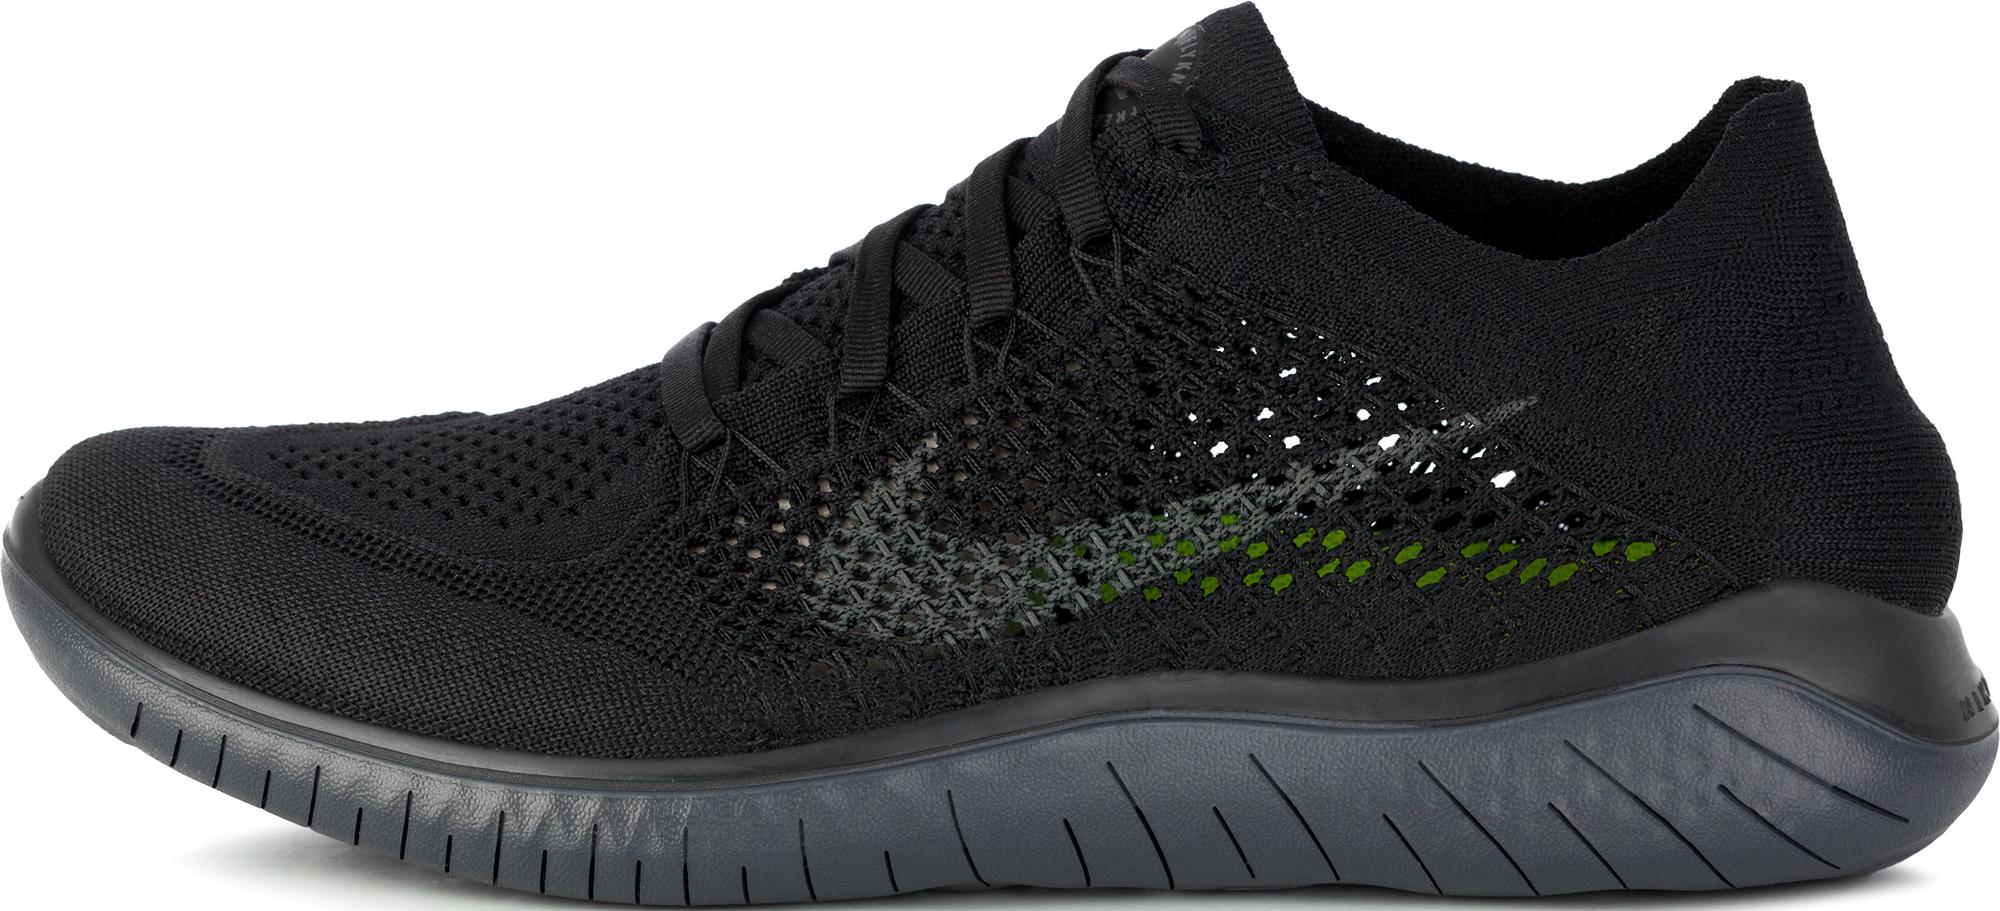 Nike Кроссовки мужские Nike Free Rn Flyknit 2018, размер 43